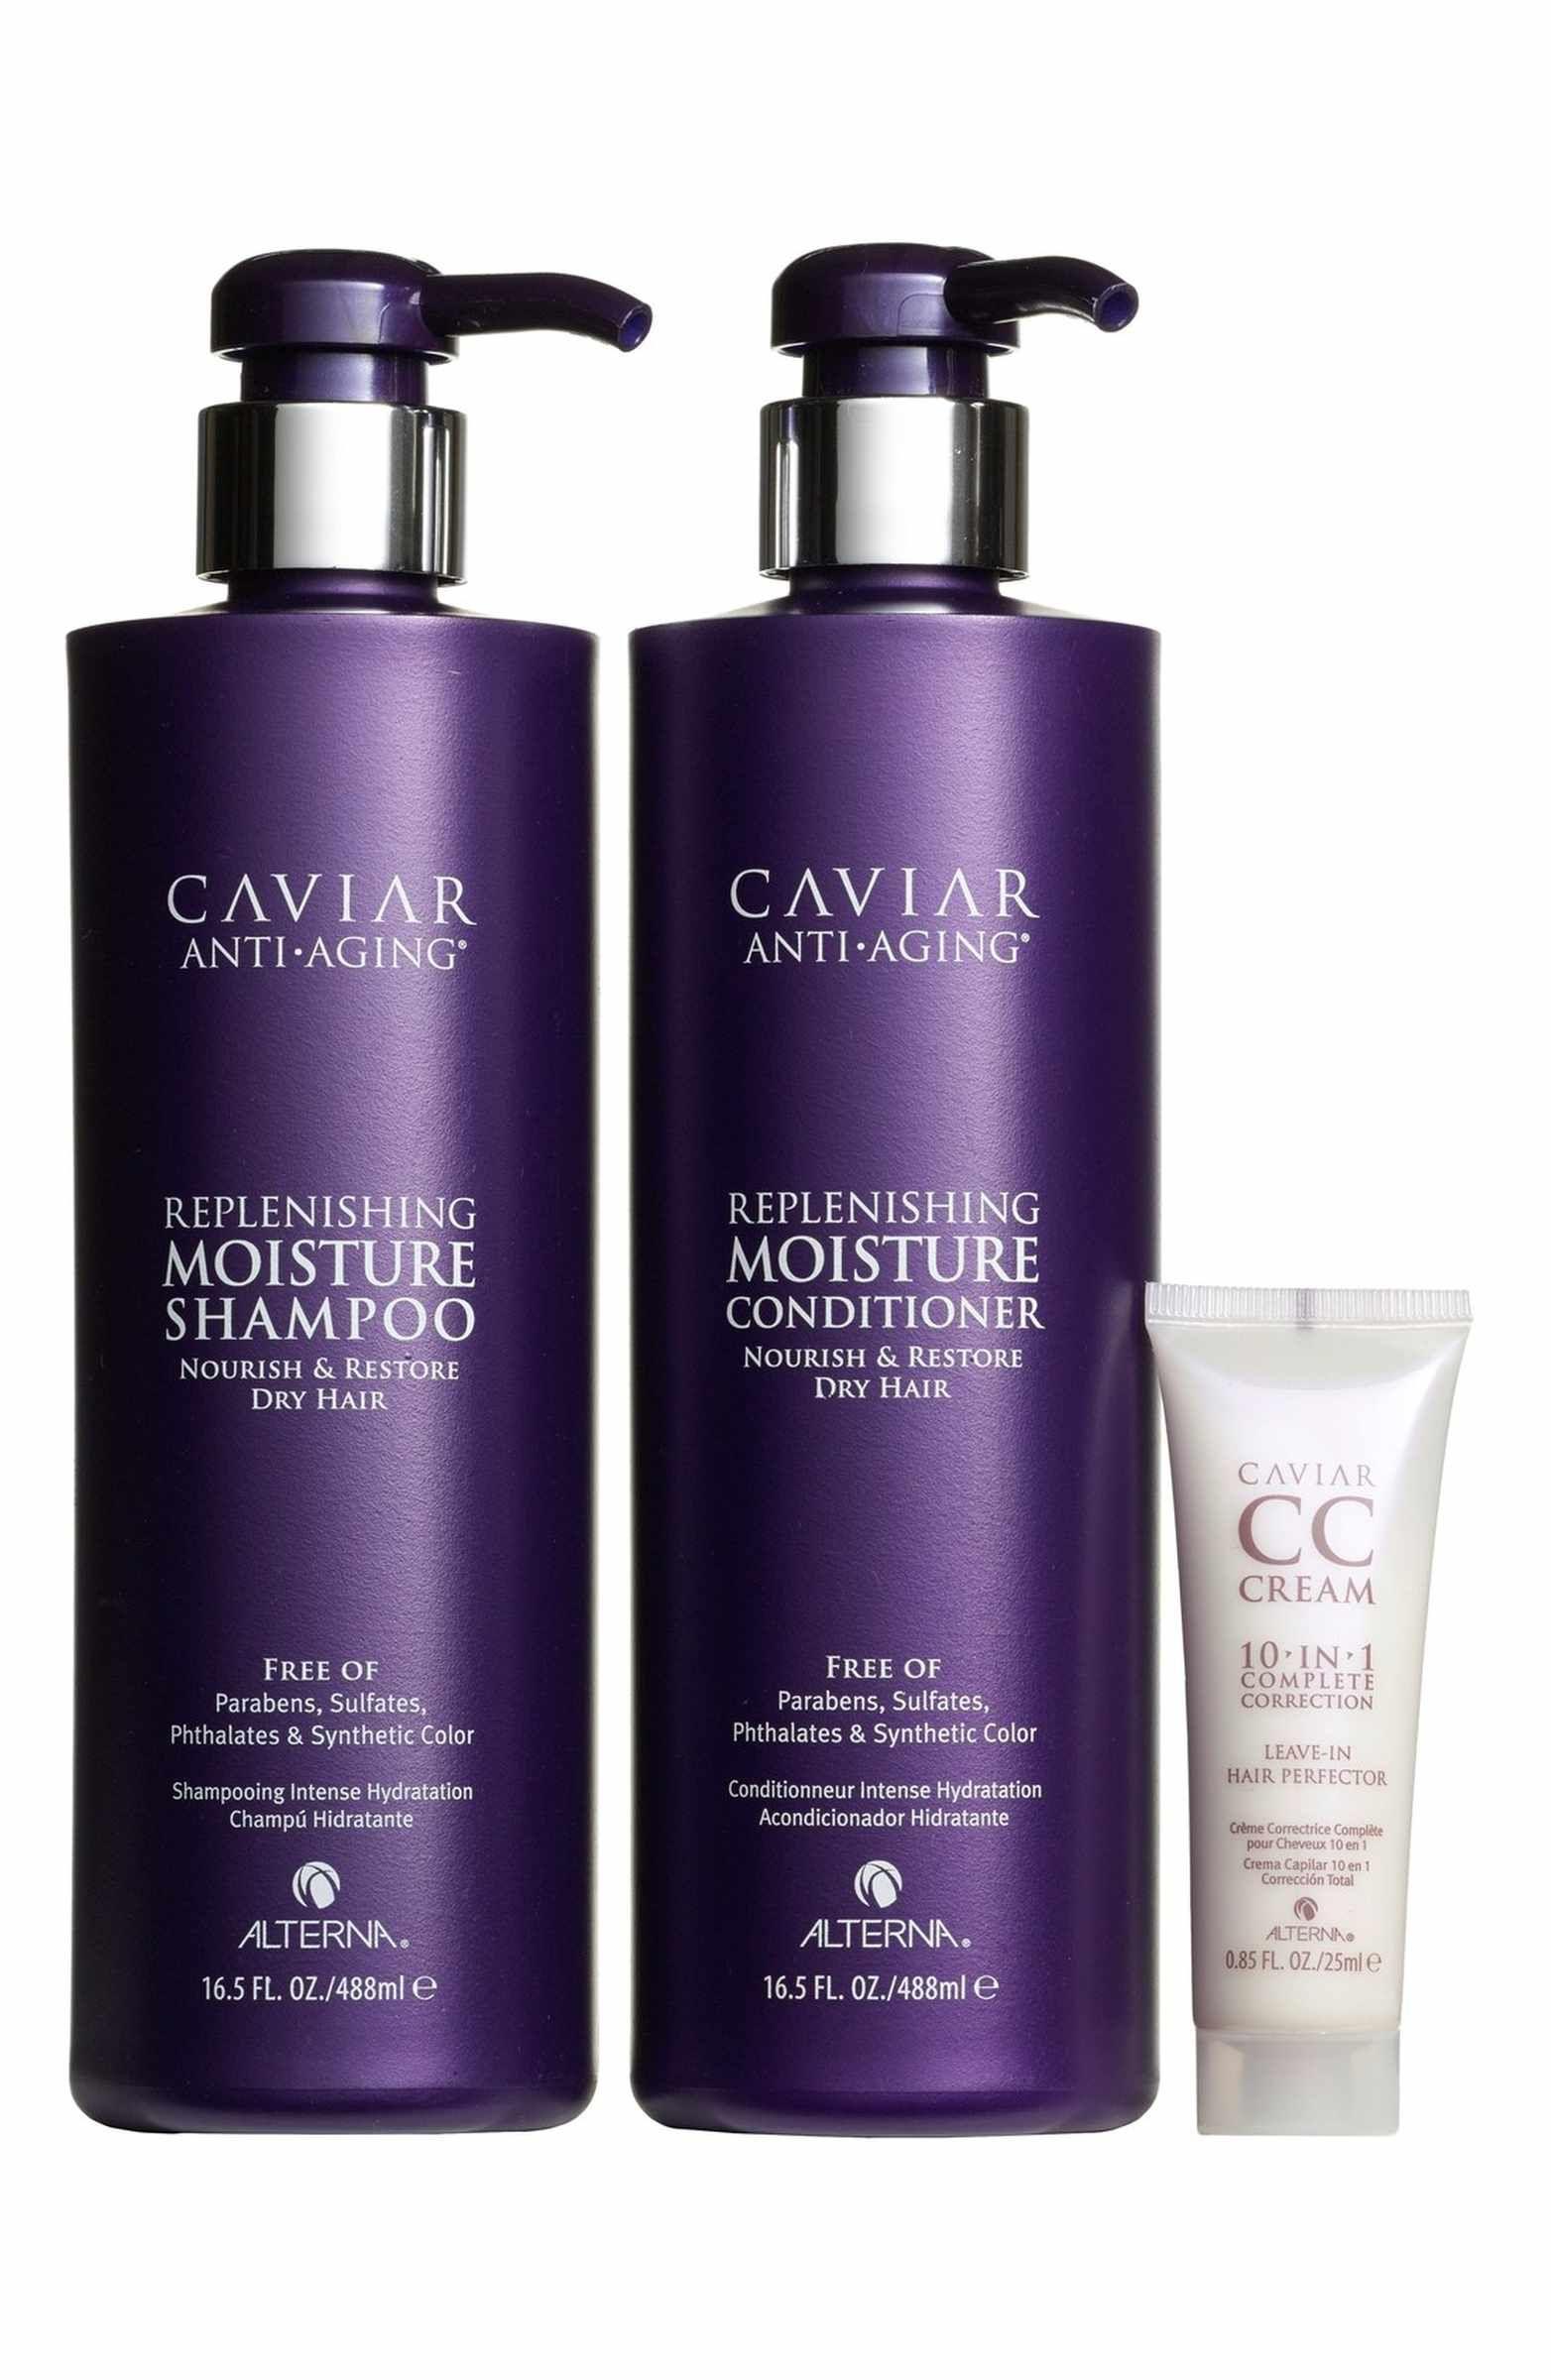 Alterna Caviar Set Usd 114 Value Caviar Shampoo Moisturizer